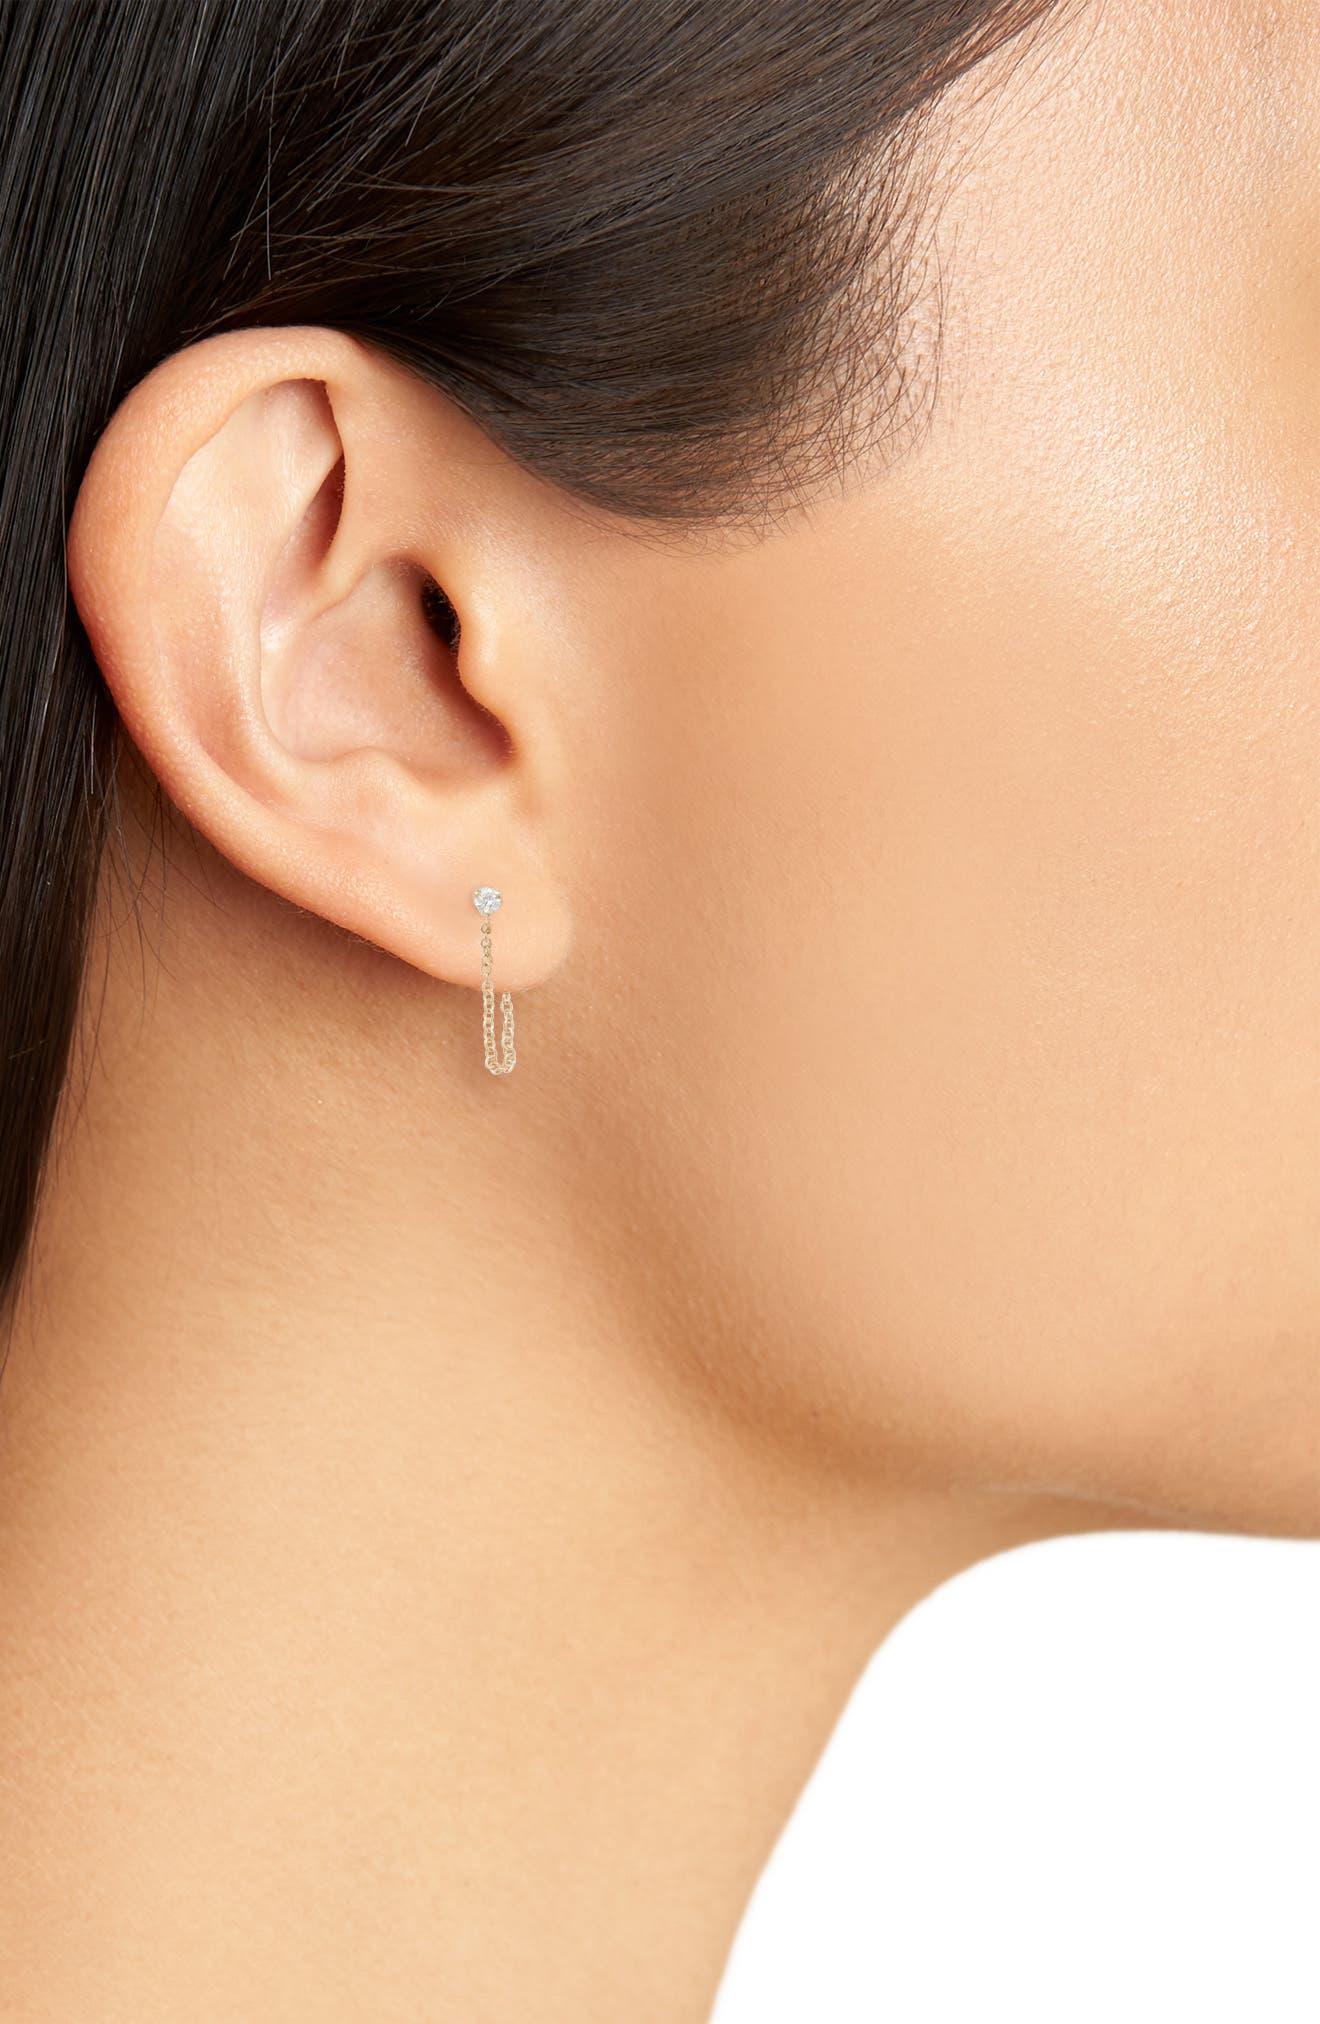 Diamond Chain Stud Earrings,                             Alternate thumbnail 2, color,                             Yellow Gold